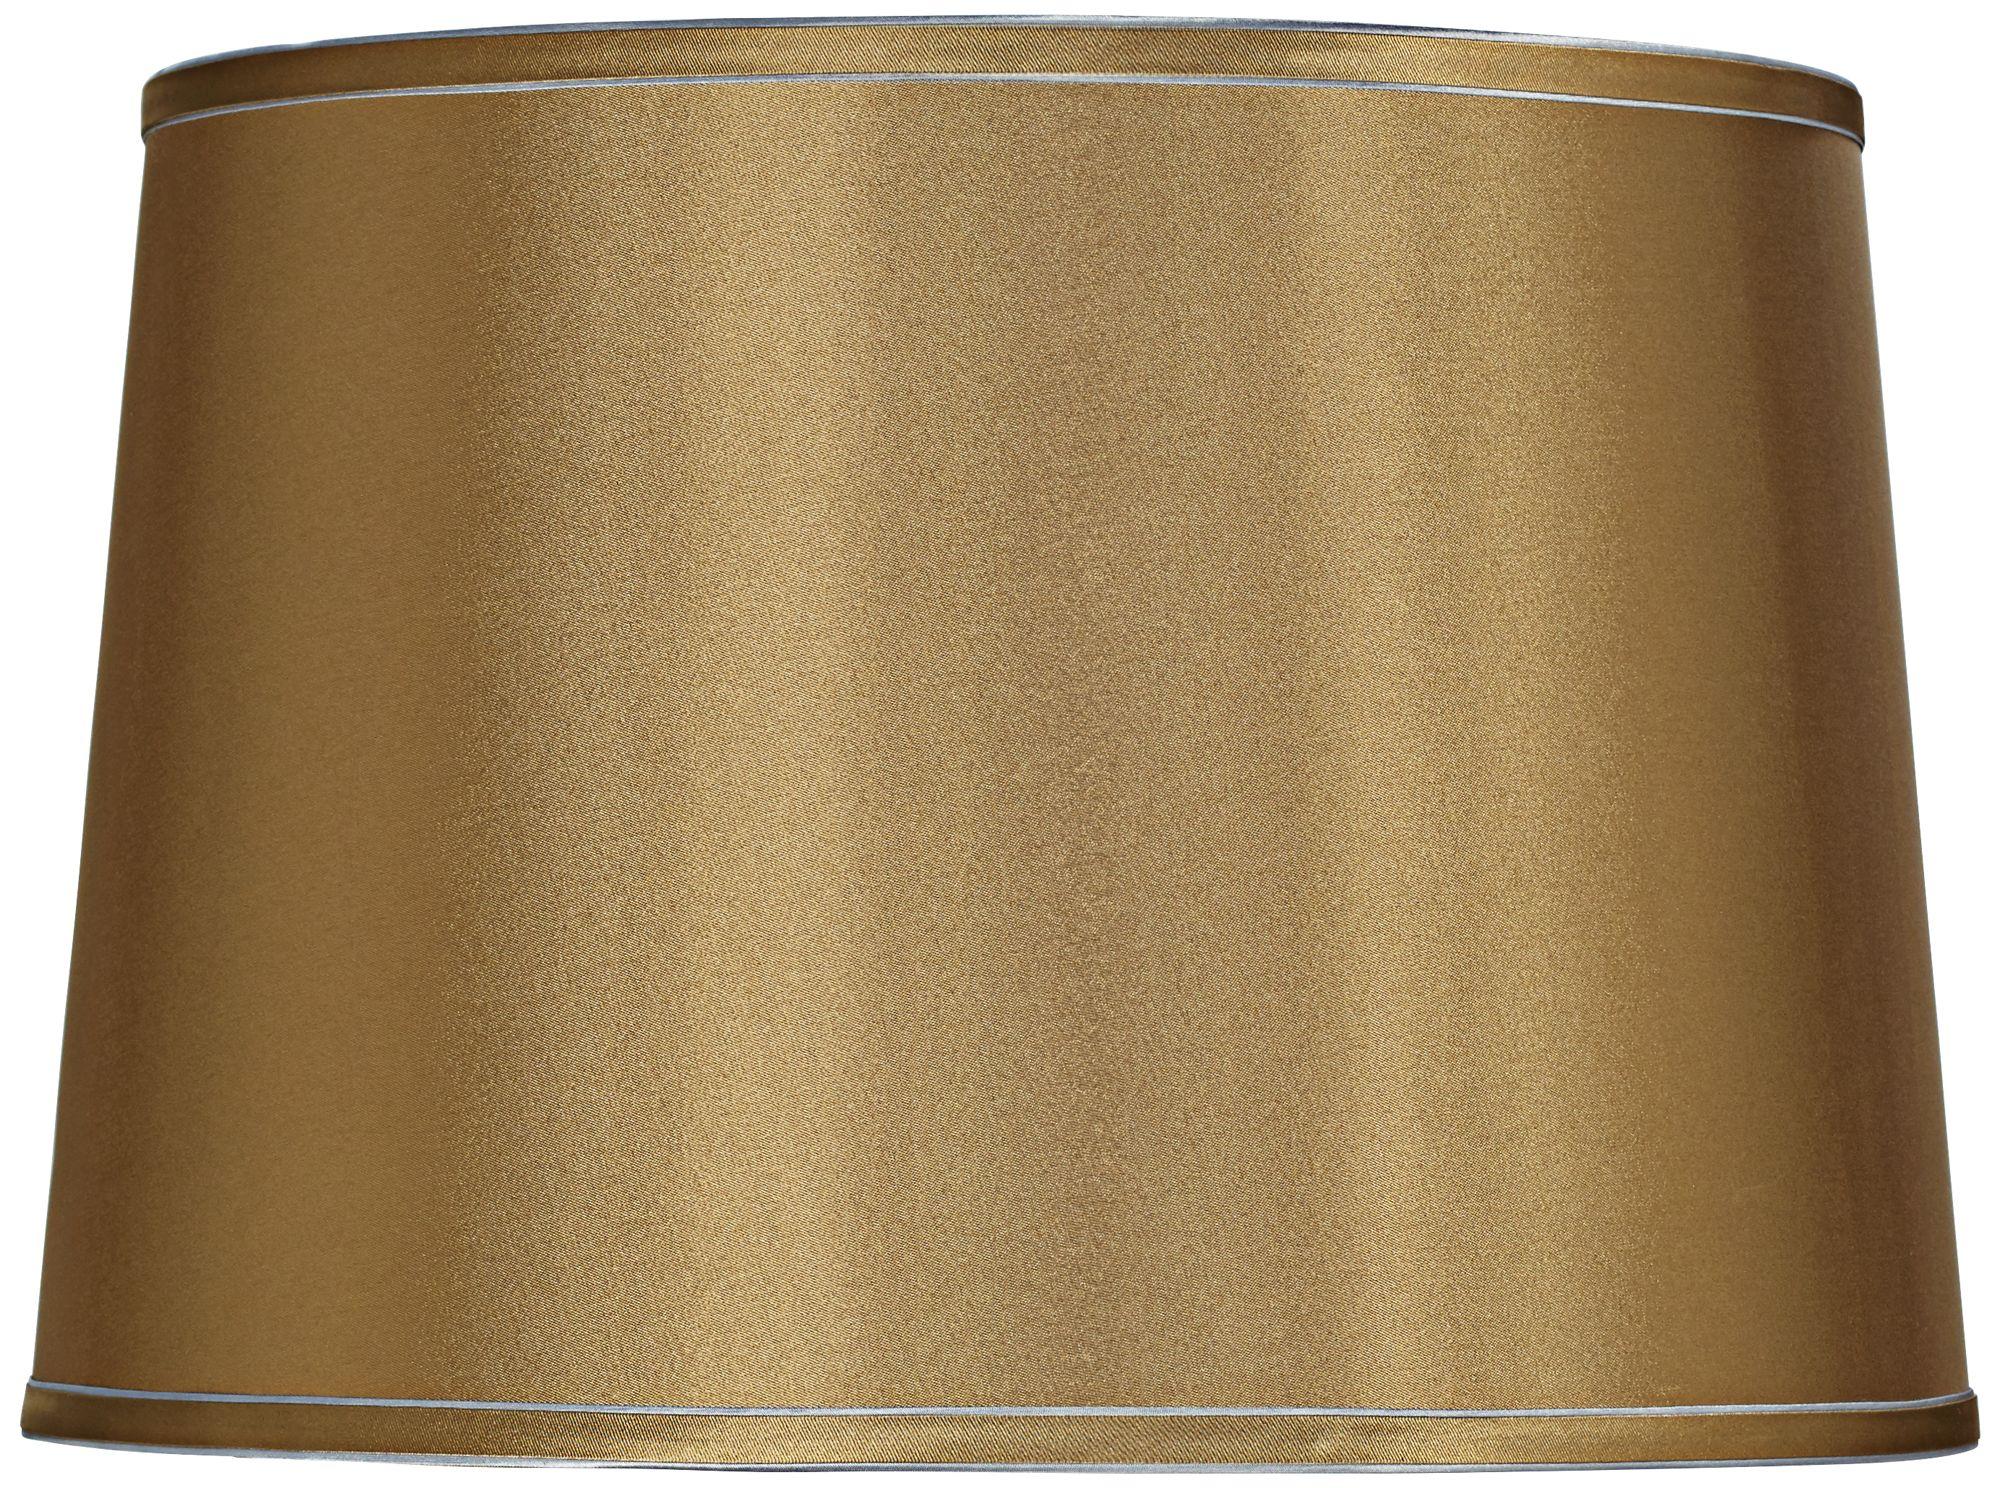 sydnee gold with silver trim drum shade 14x16x11 spider